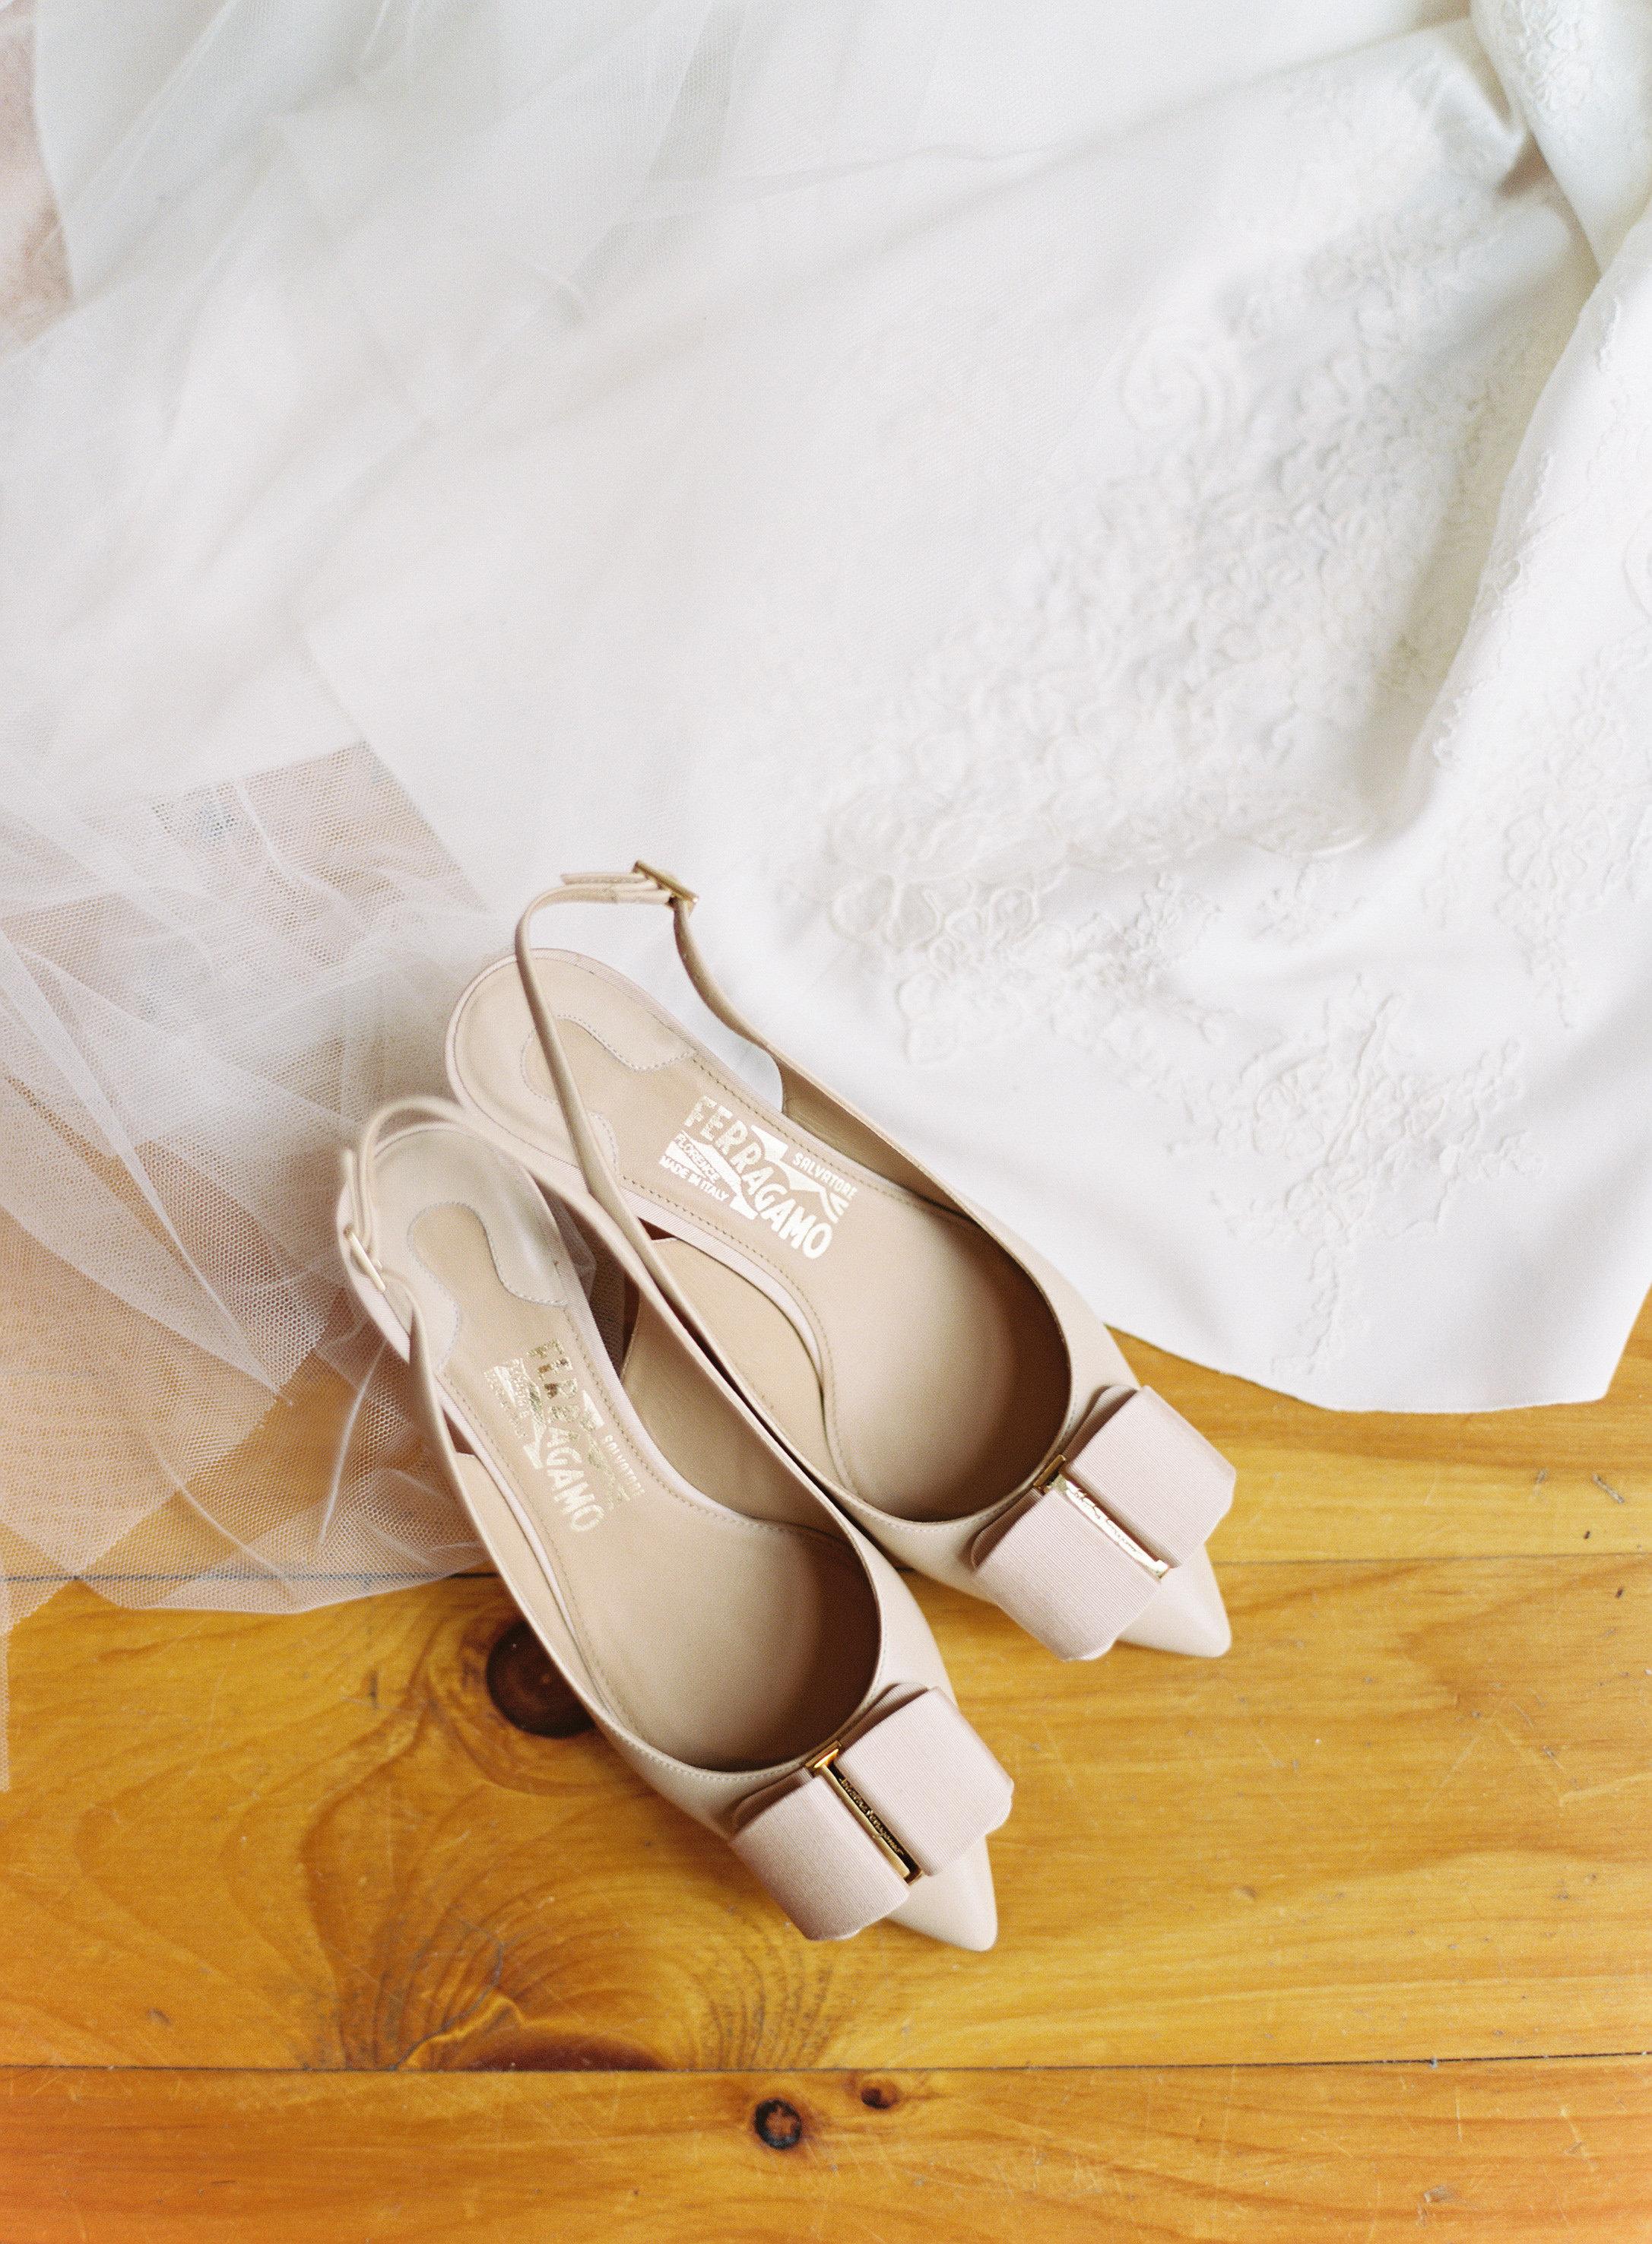 Ferragamo Wedding Heels